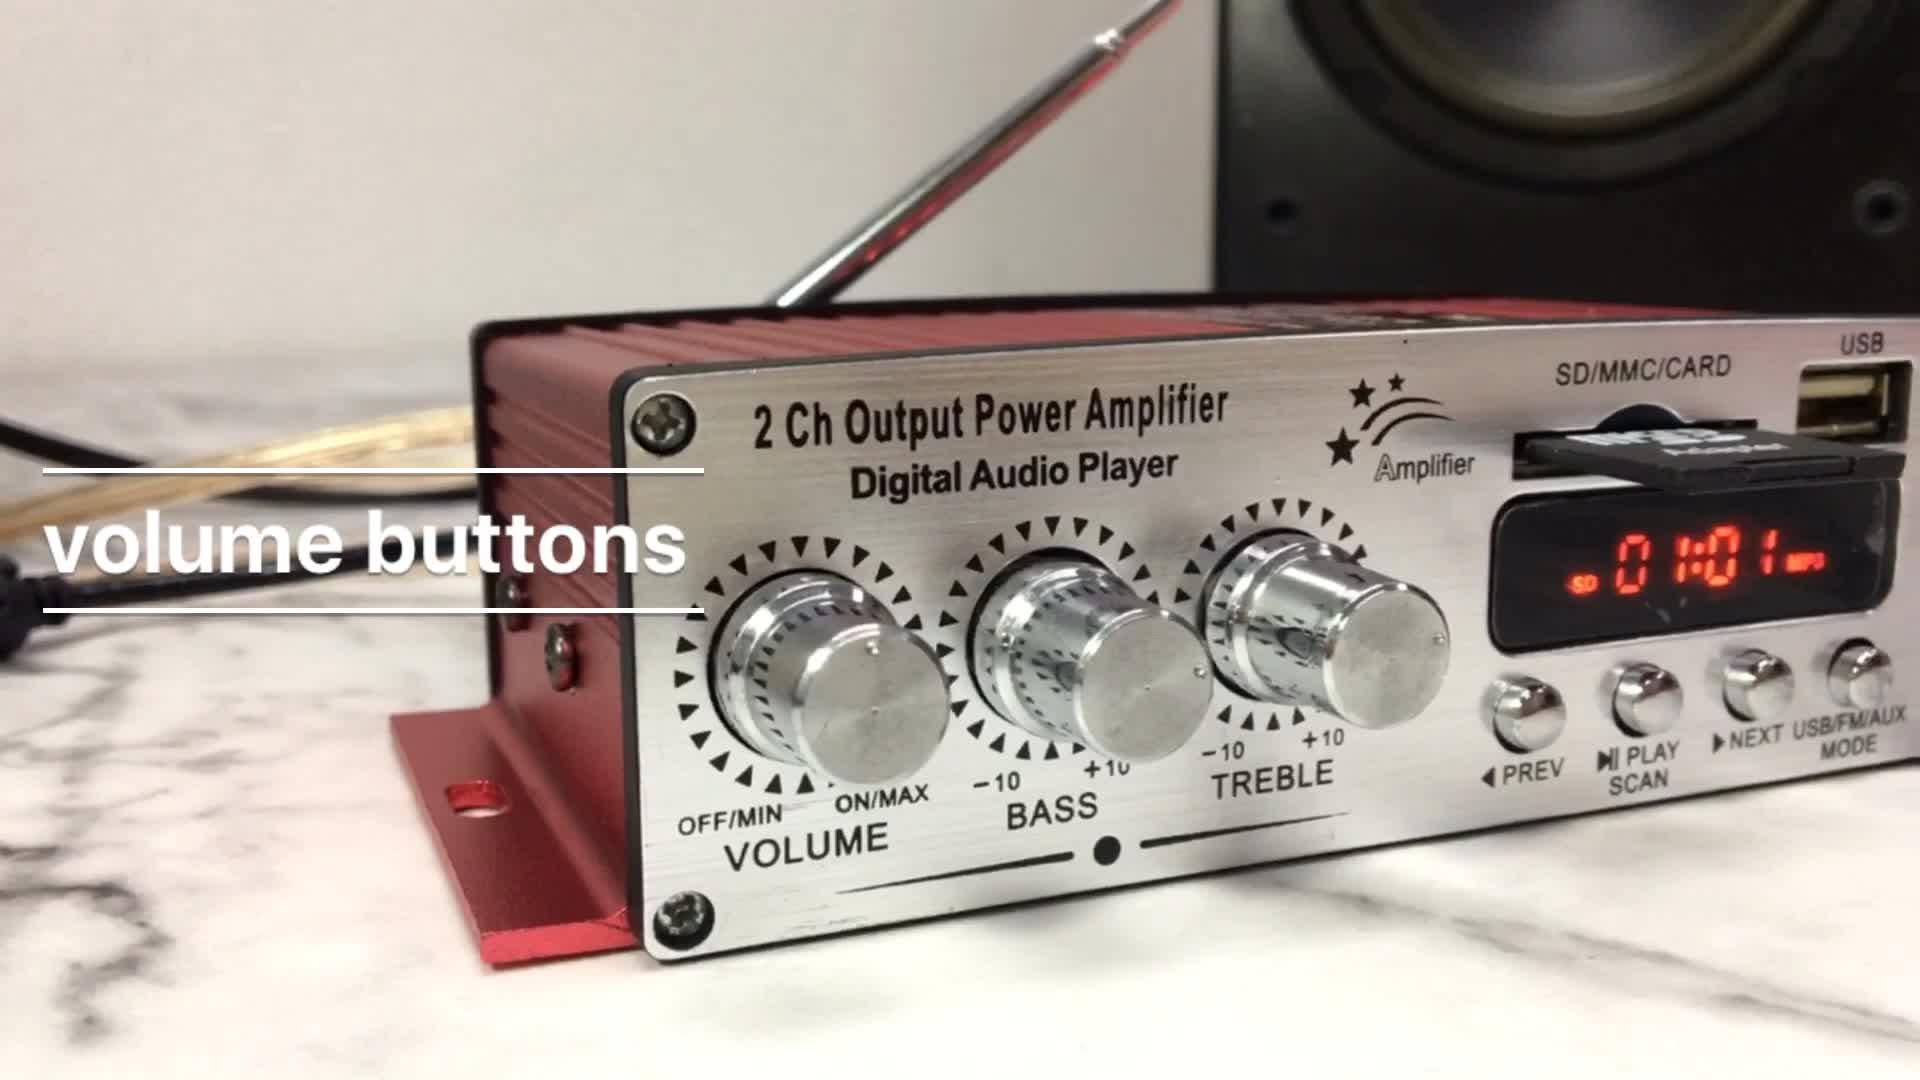 MA-120 DC 12v ses amplifikatör devresi usb sd fm diy ses güç amplifikatörleri